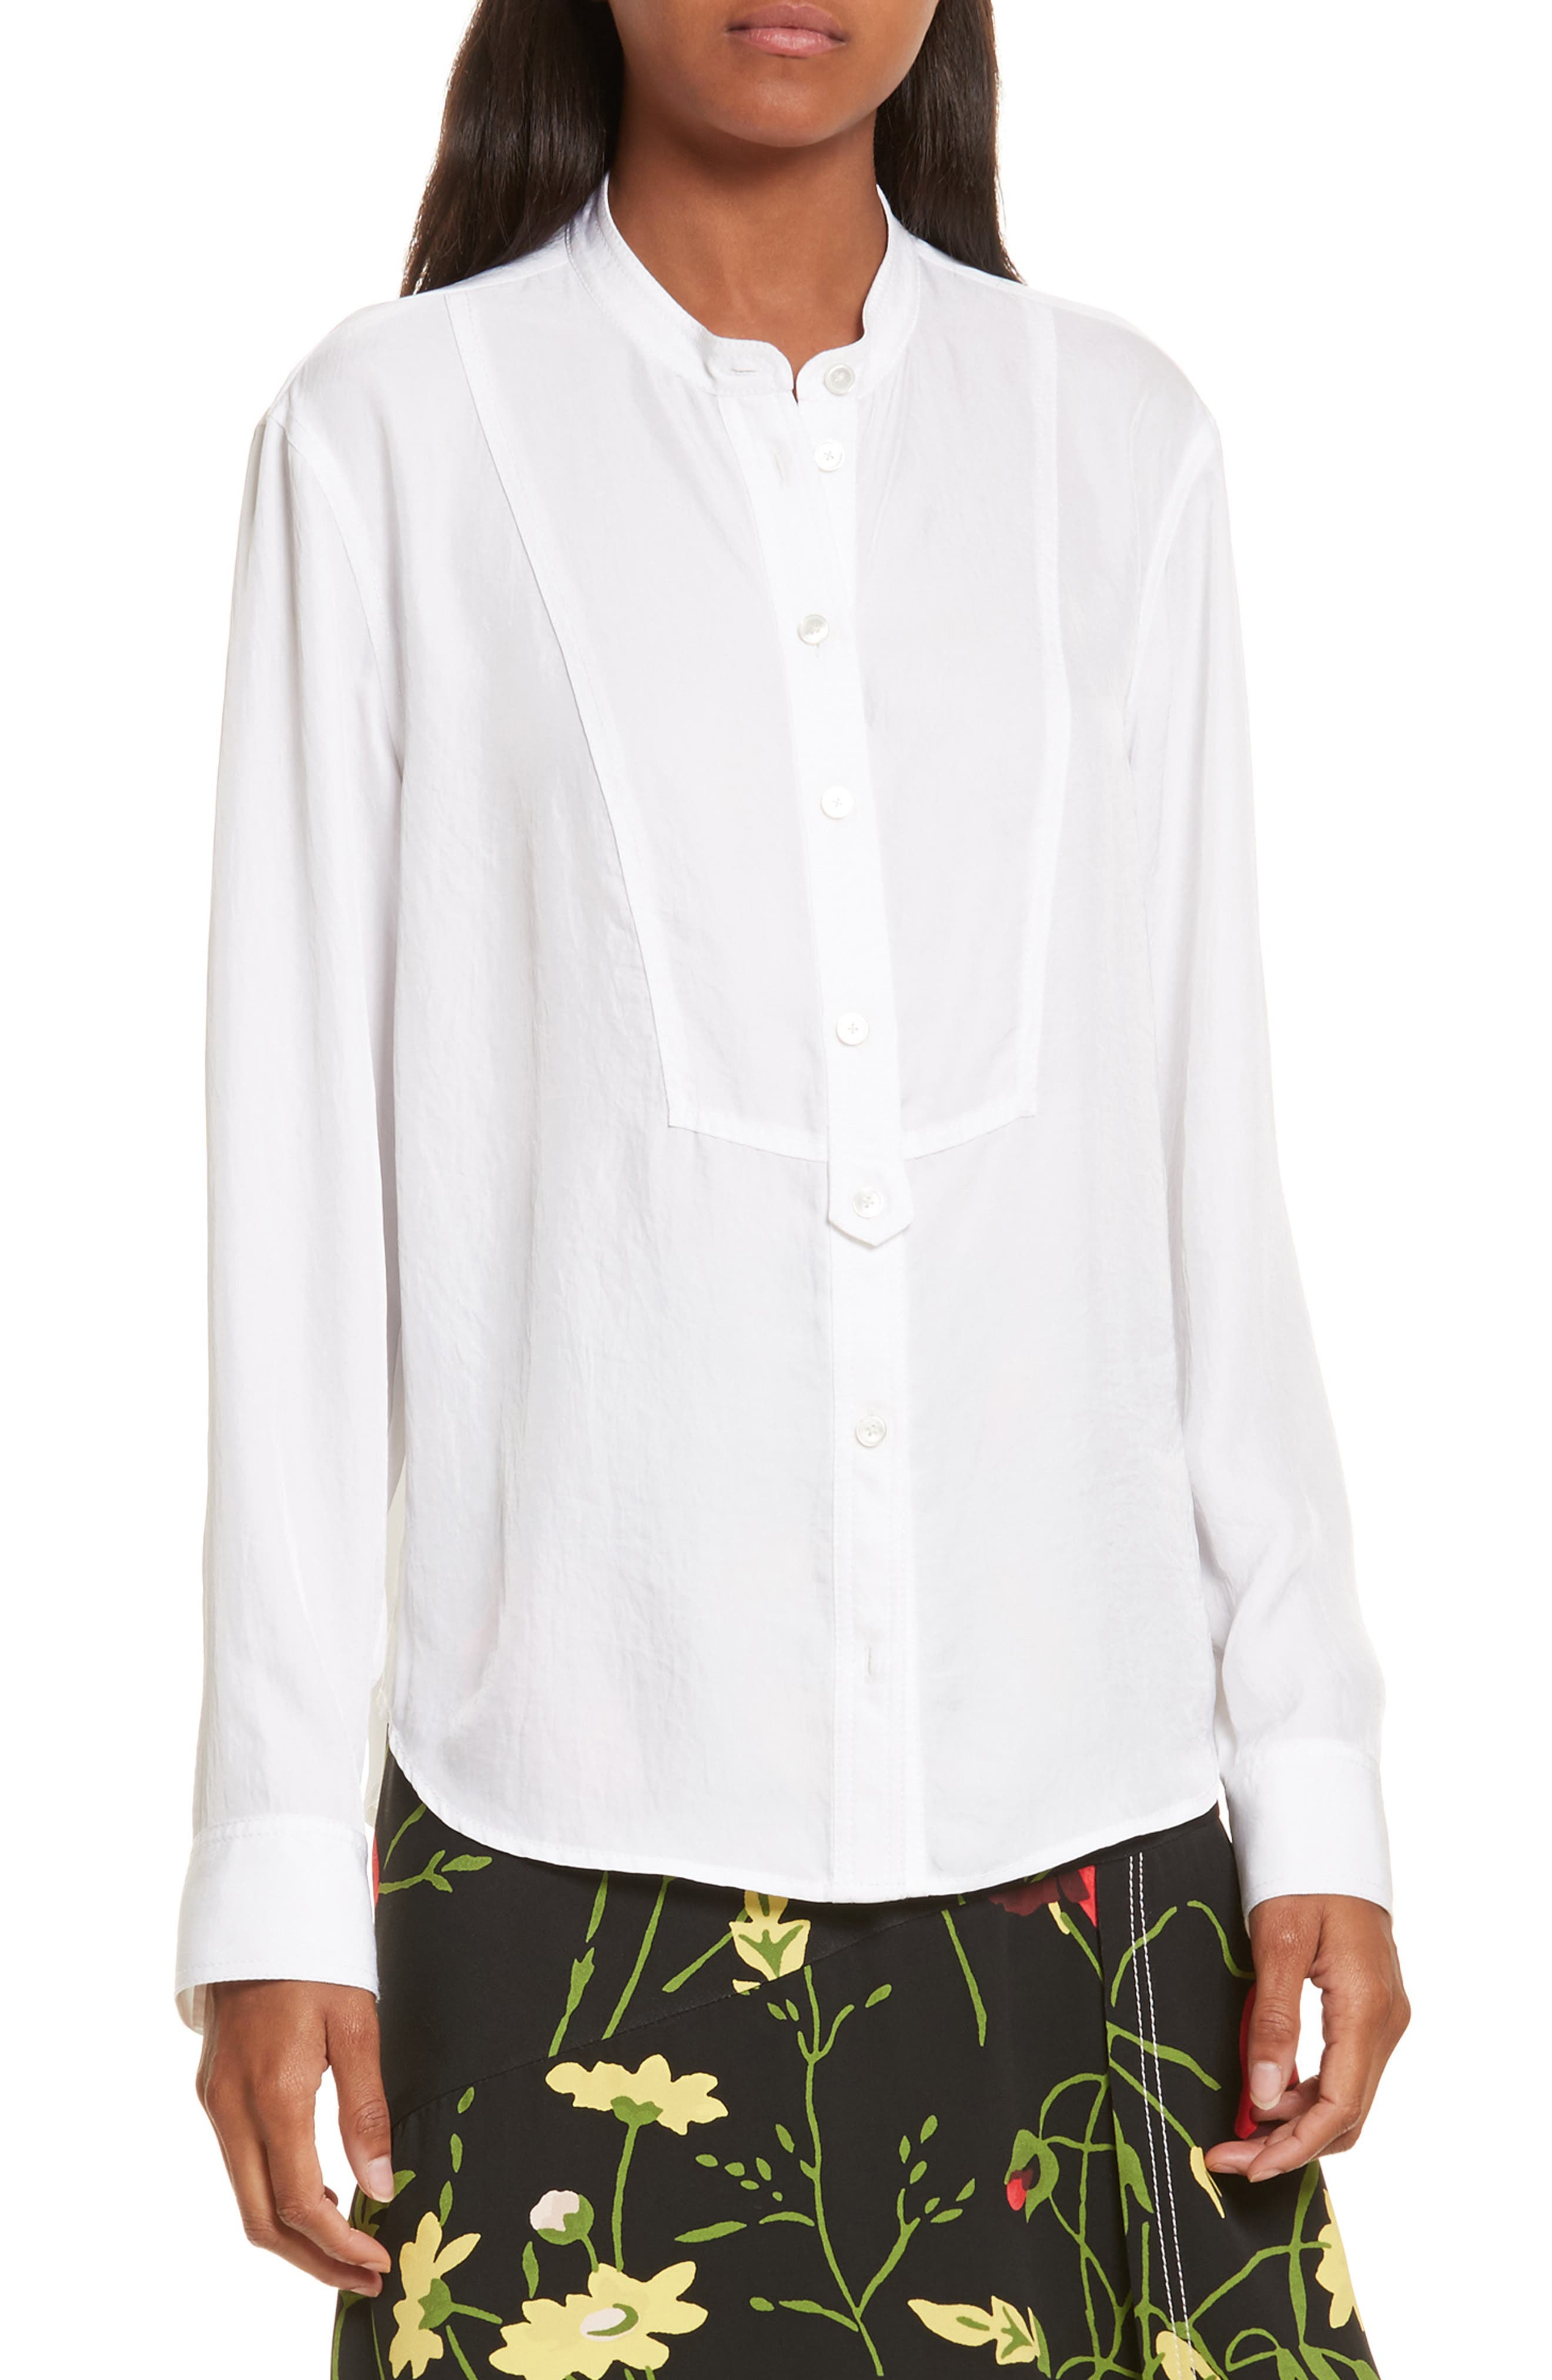 GREY Jason Wu Twill Shirt